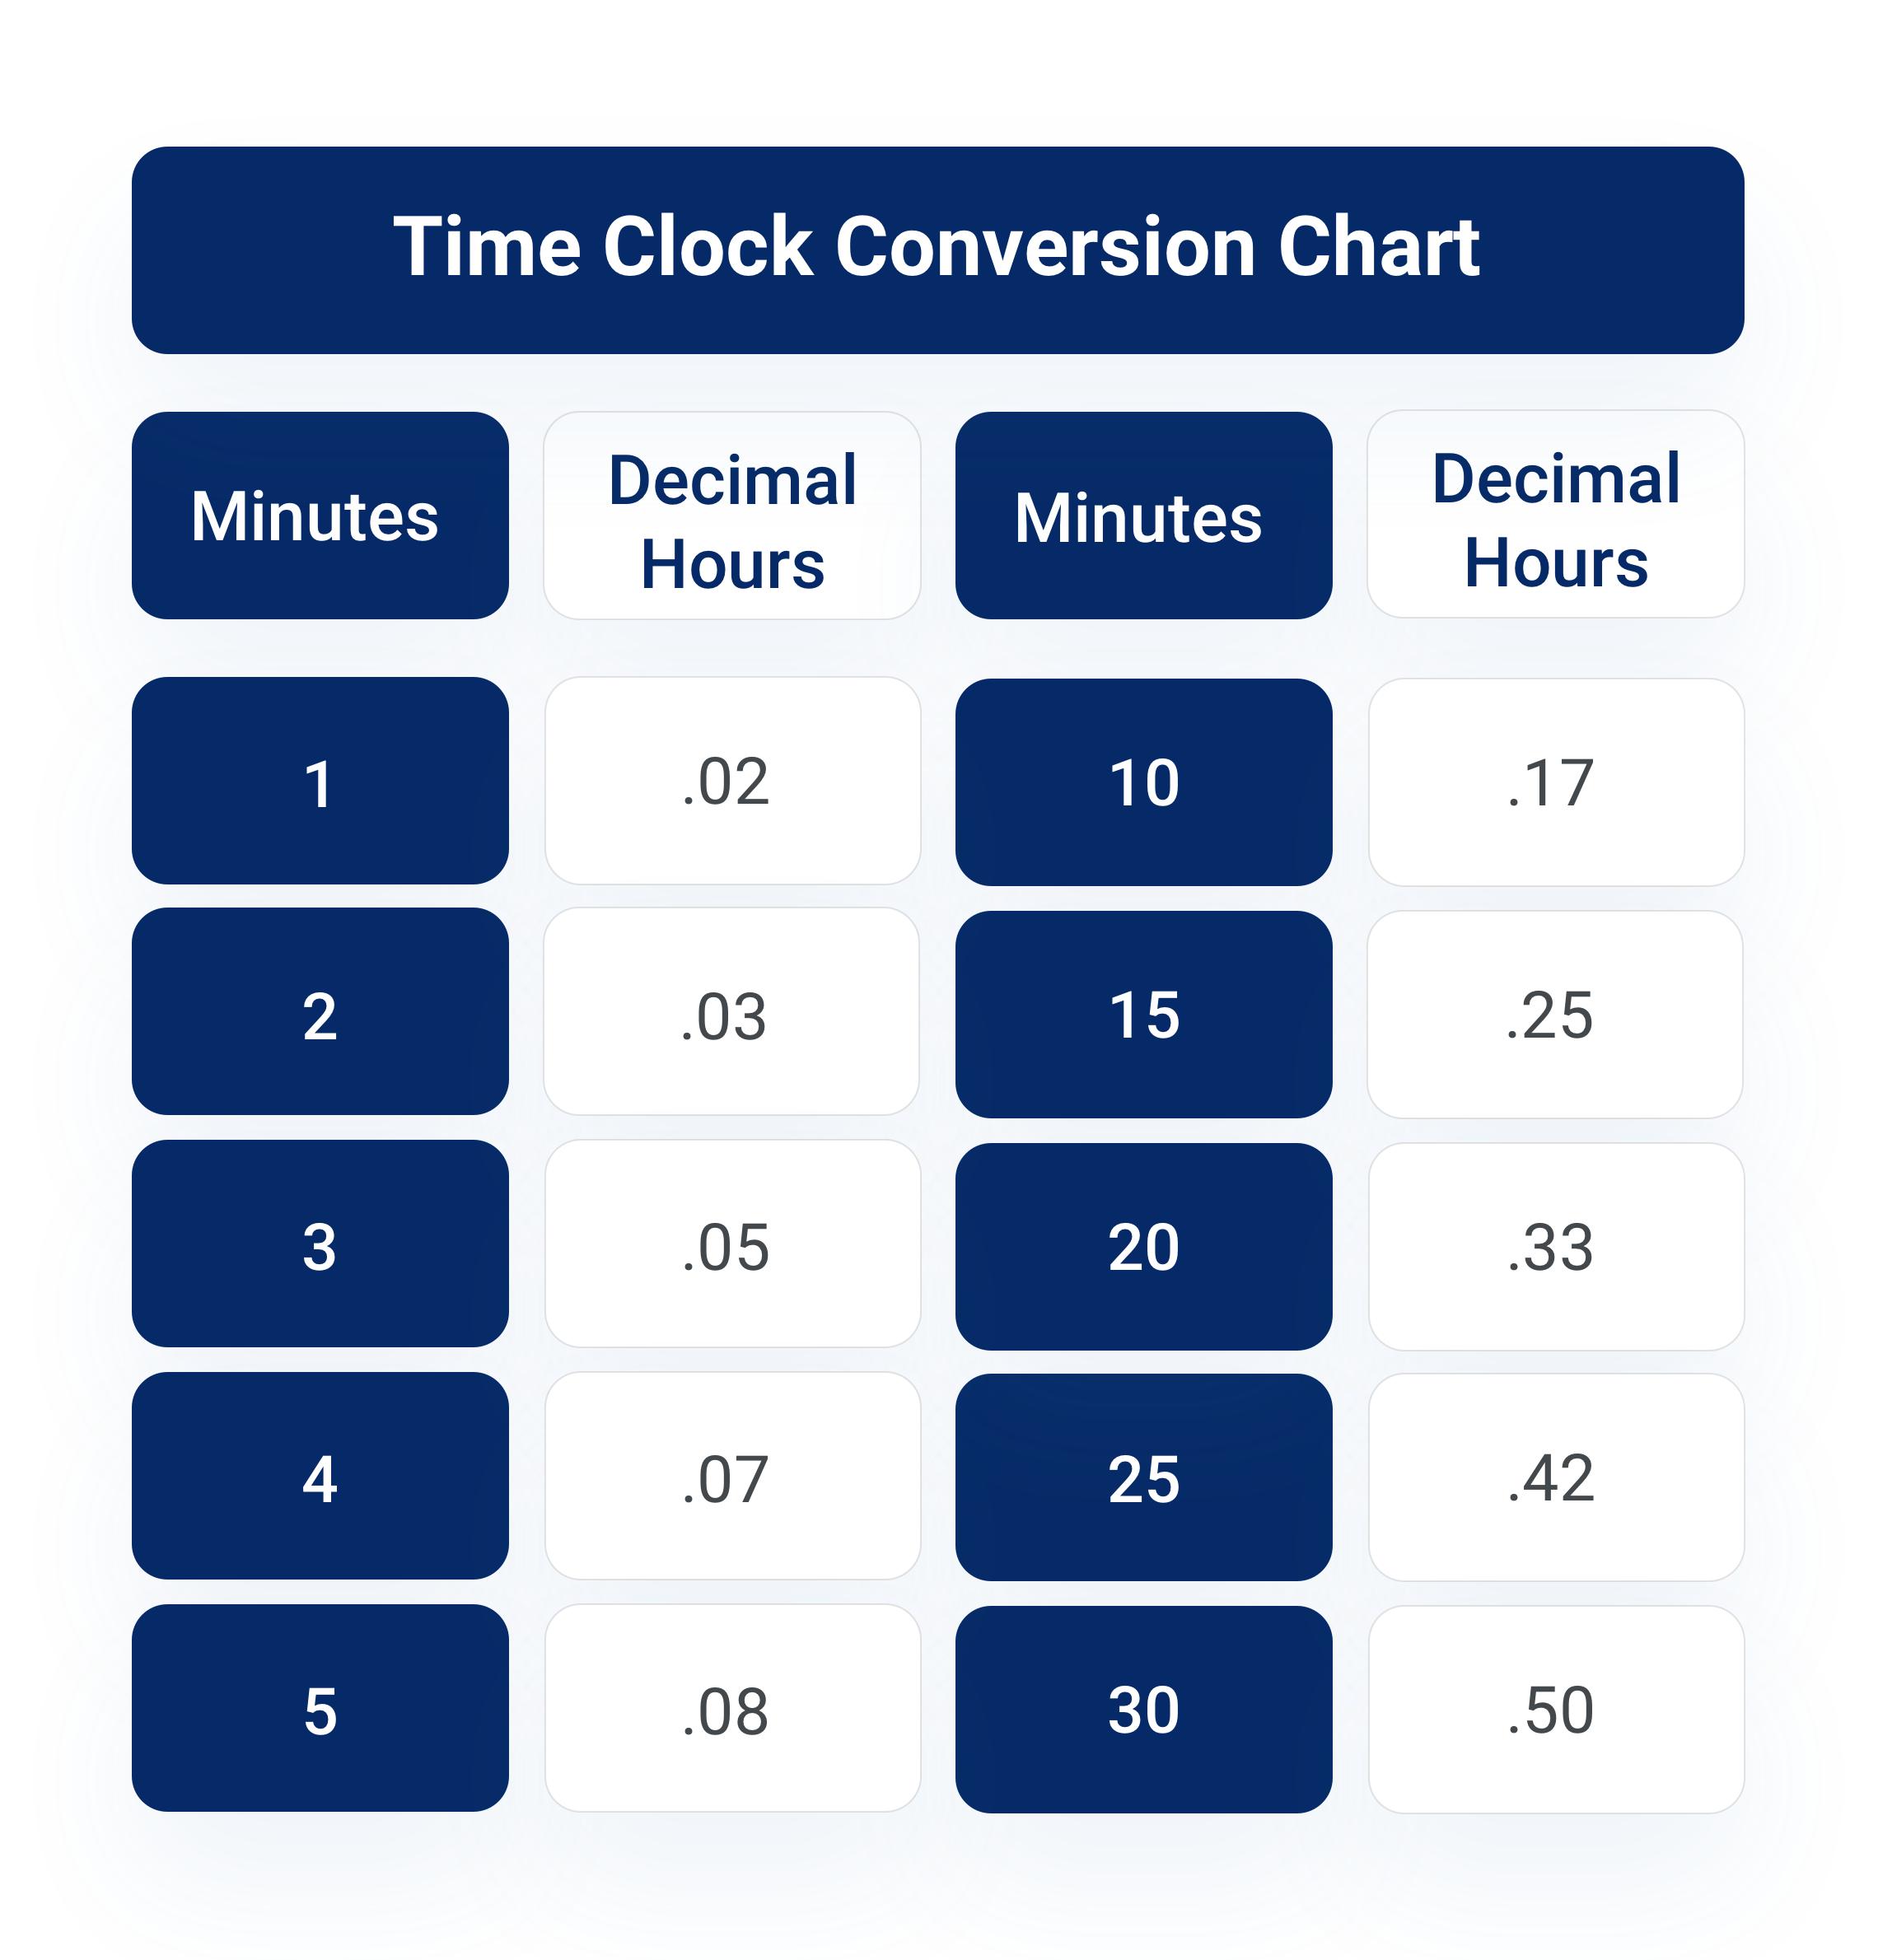 Time clock conversion chart.